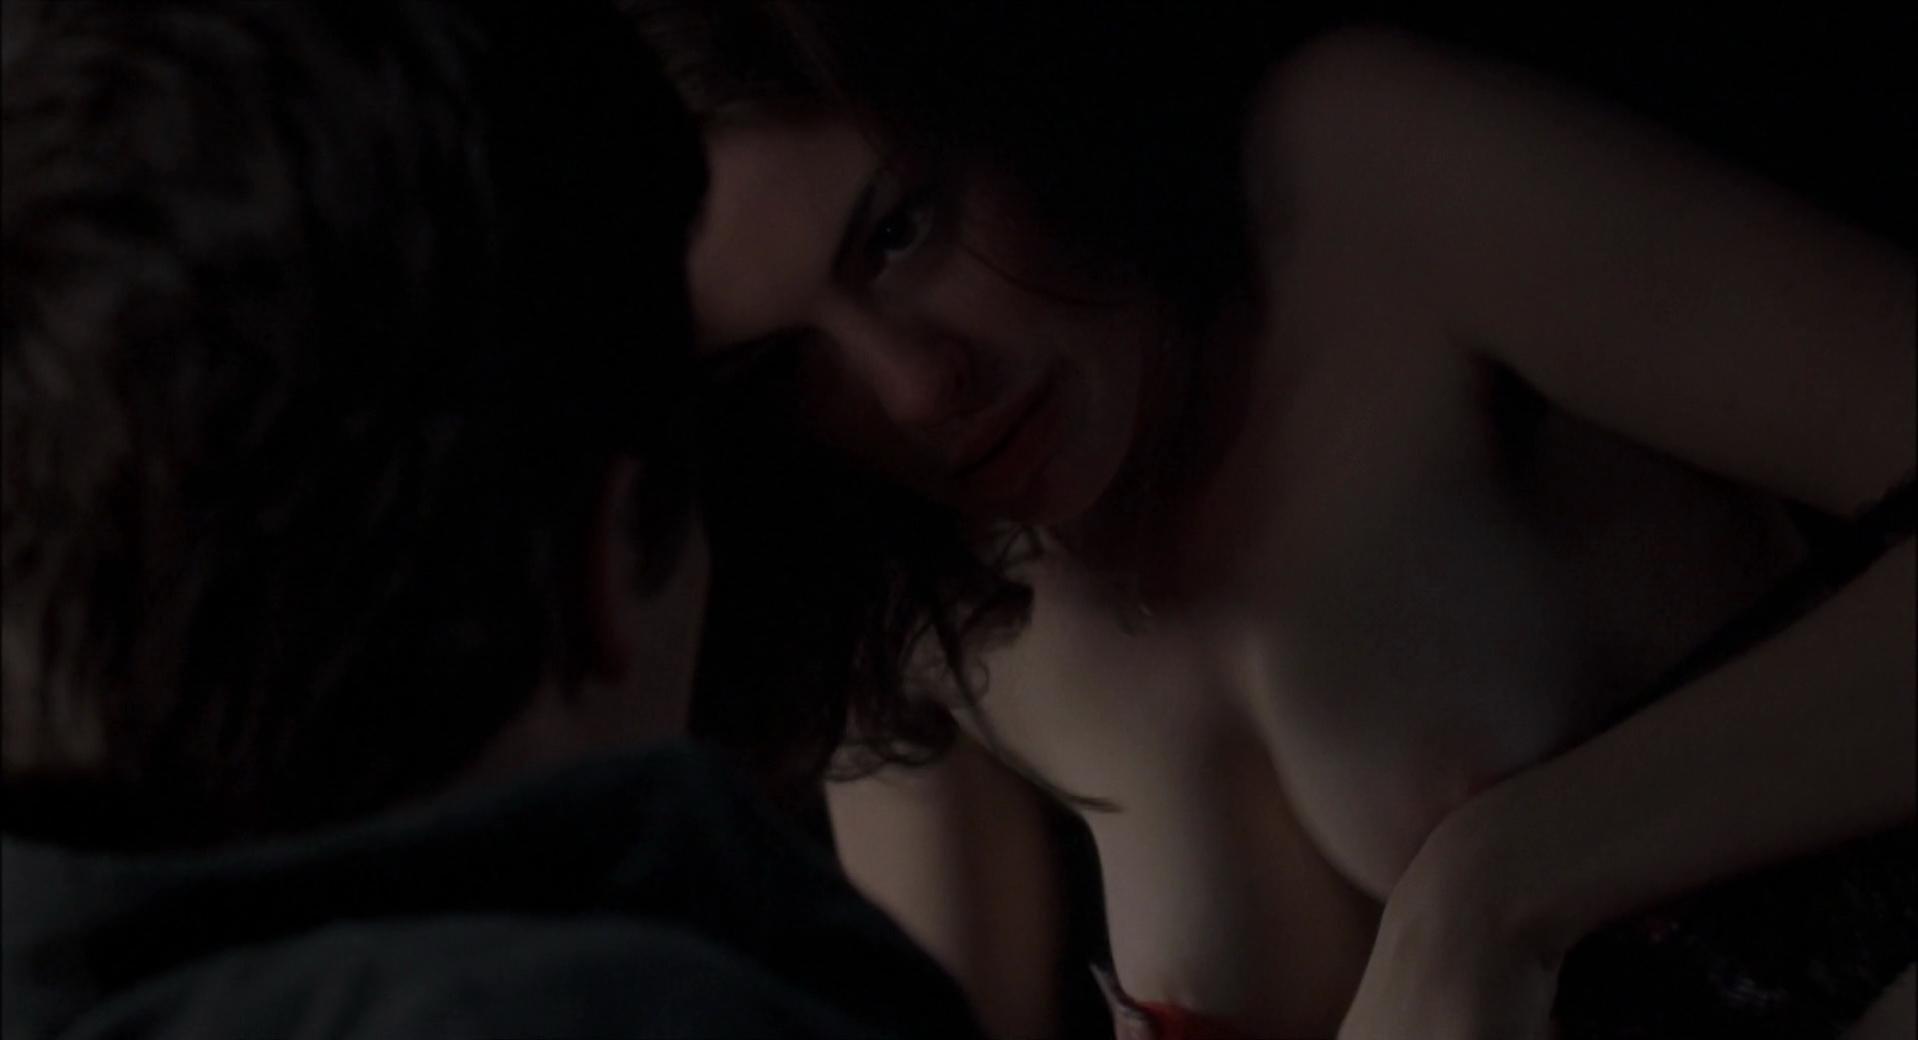 Anne hathaway nude in brokeback mountain